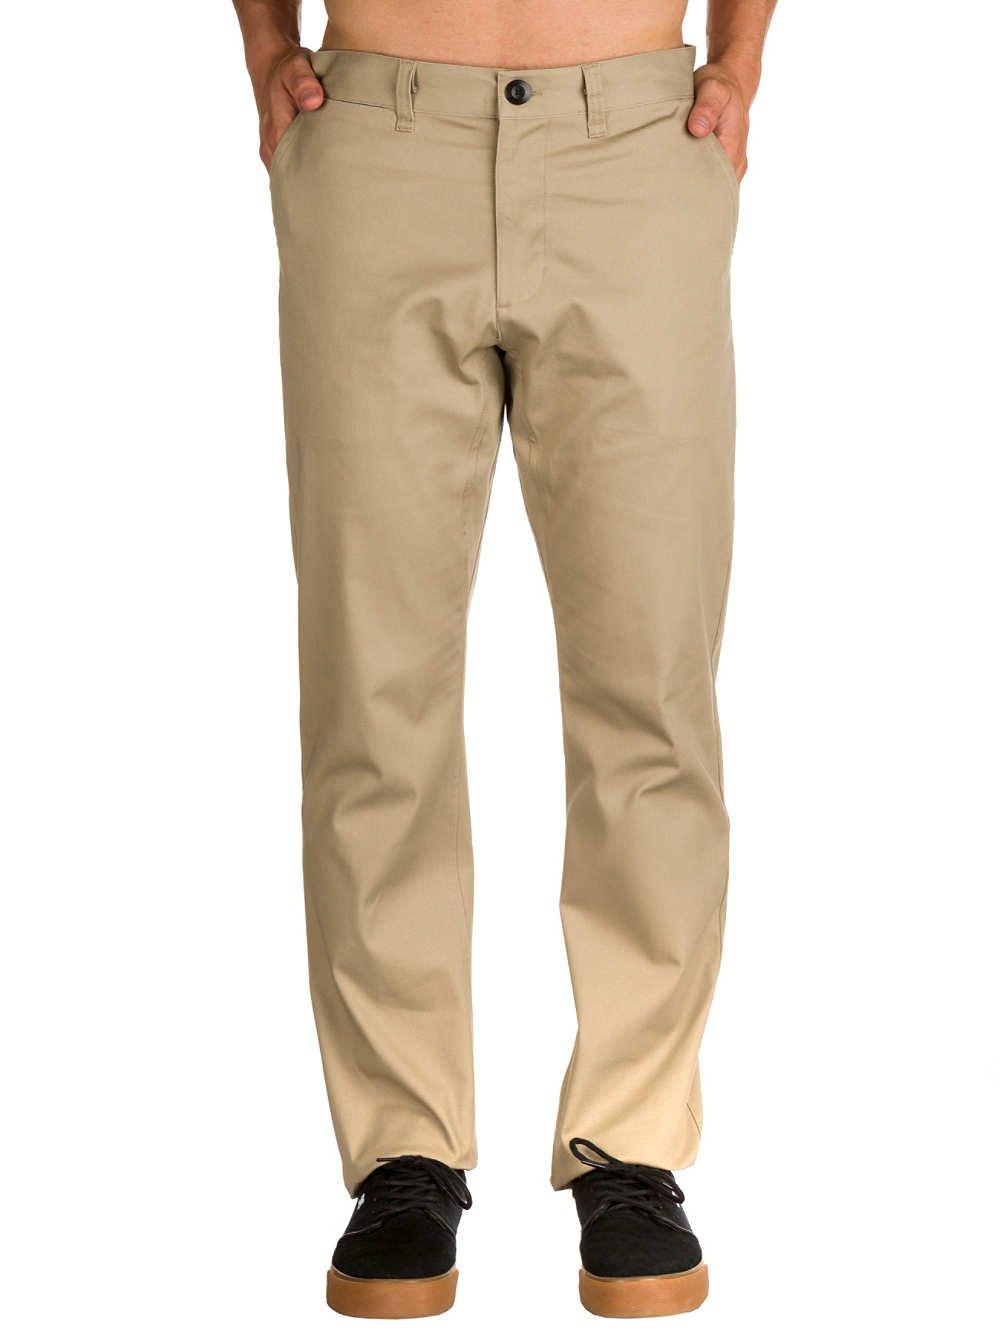 7392d4e9f42d Amazon.com  Nike Men s SB Flex Icon Chino Skateboarding Pants   Sports    Outdoors